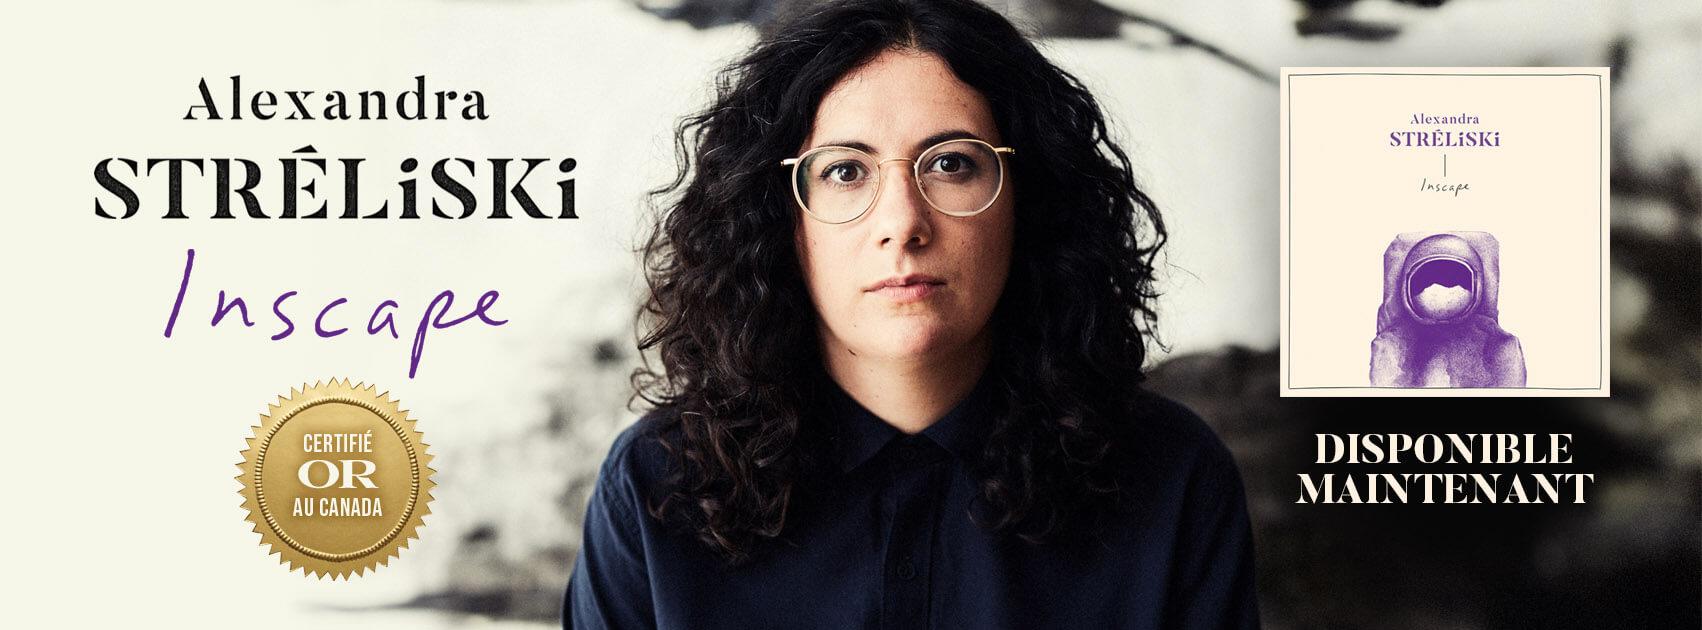 AlexandraStreliski-SCRWebsite-FR